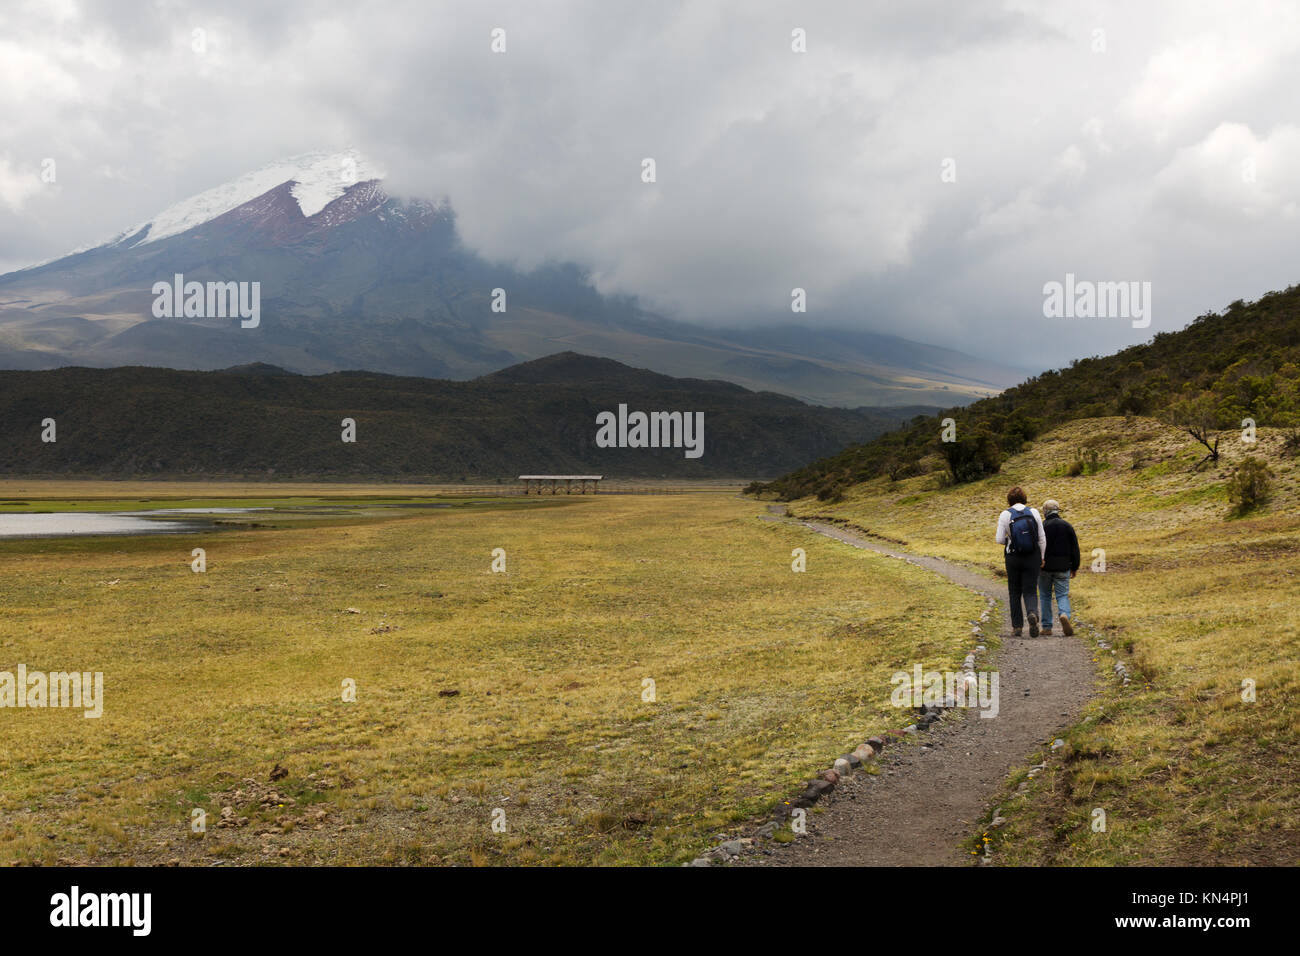 Cotopaxi National Park, Ecuador - people walking in the park, Ecuador, South America - Stock Image